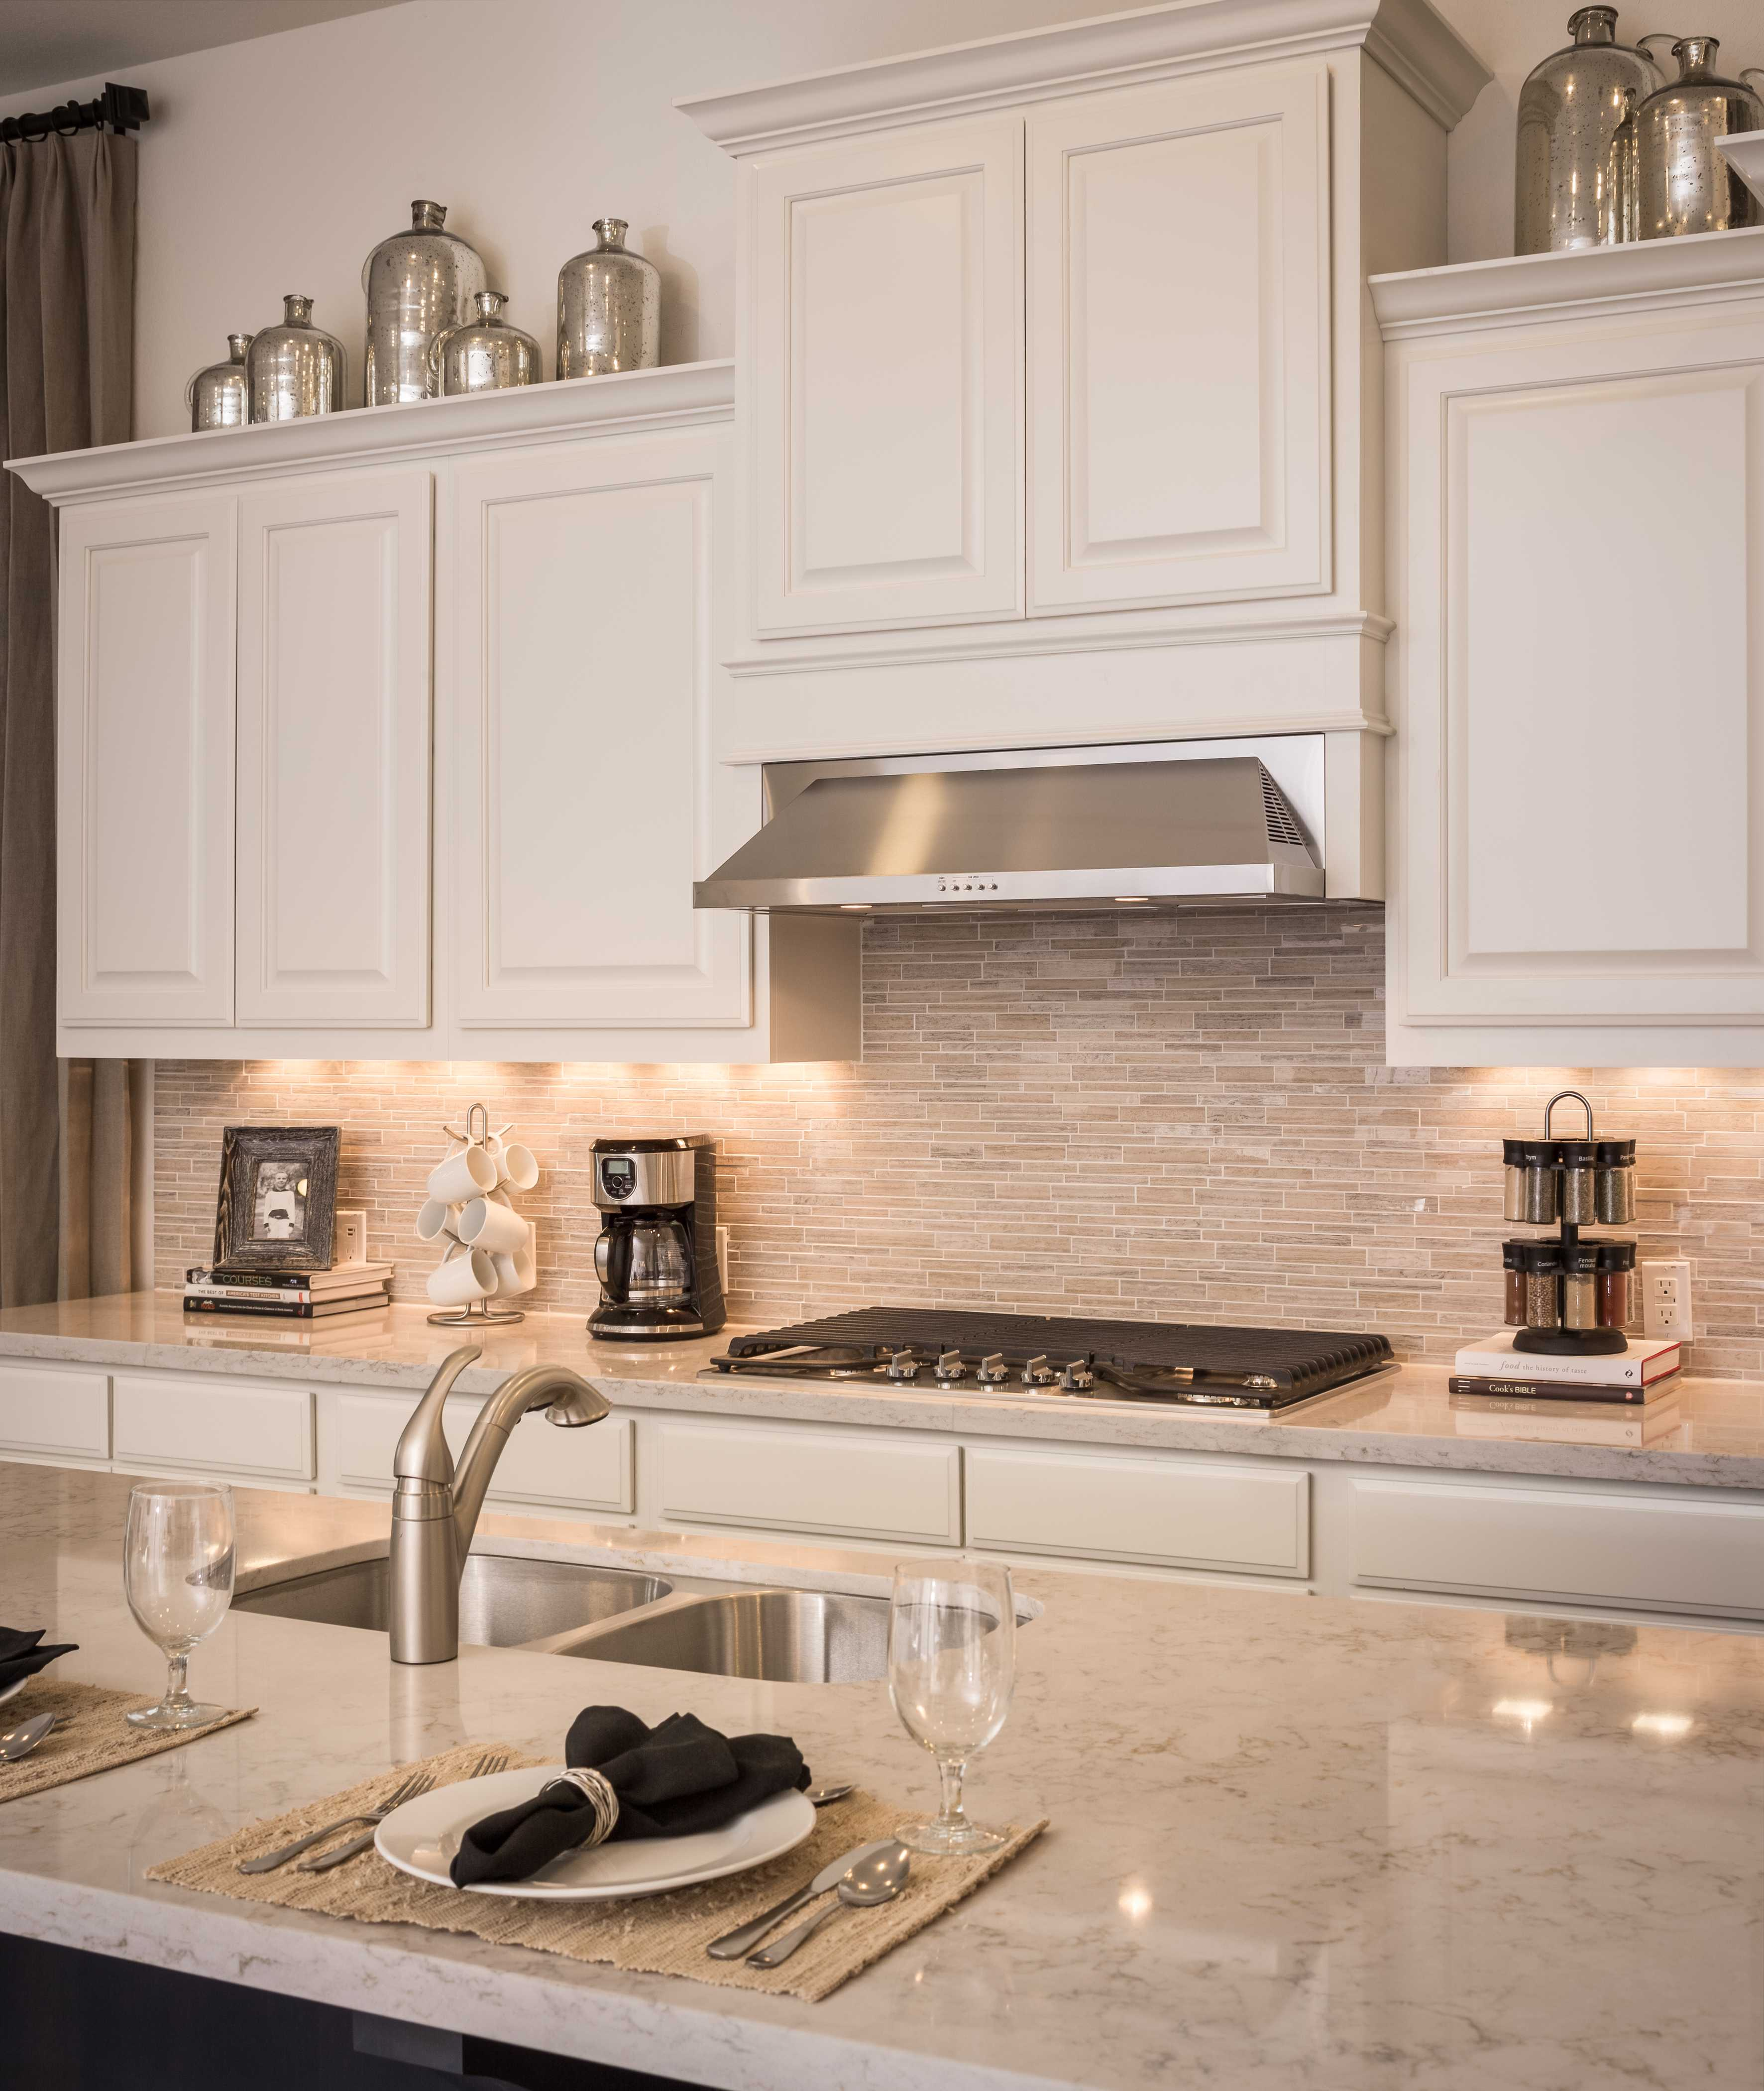 Kitchen Cabinets In San Antonio: Home Builder In San Antonio TX